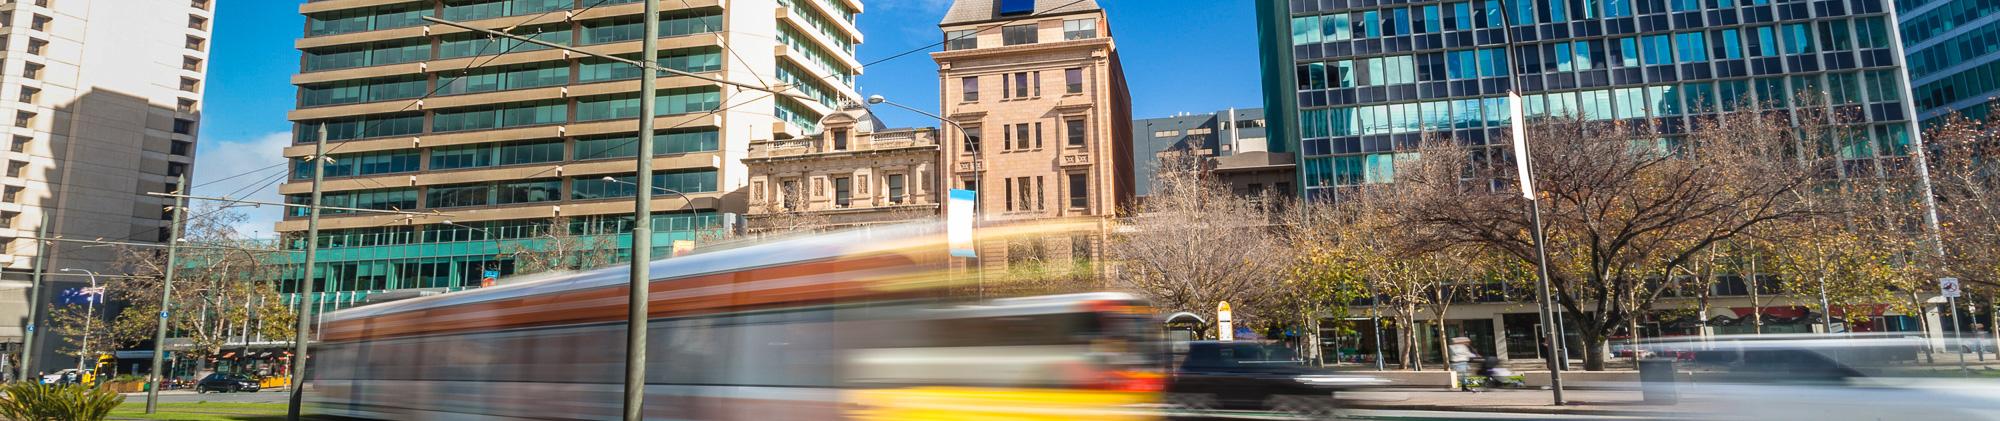 20140710-city-vic-square-tram